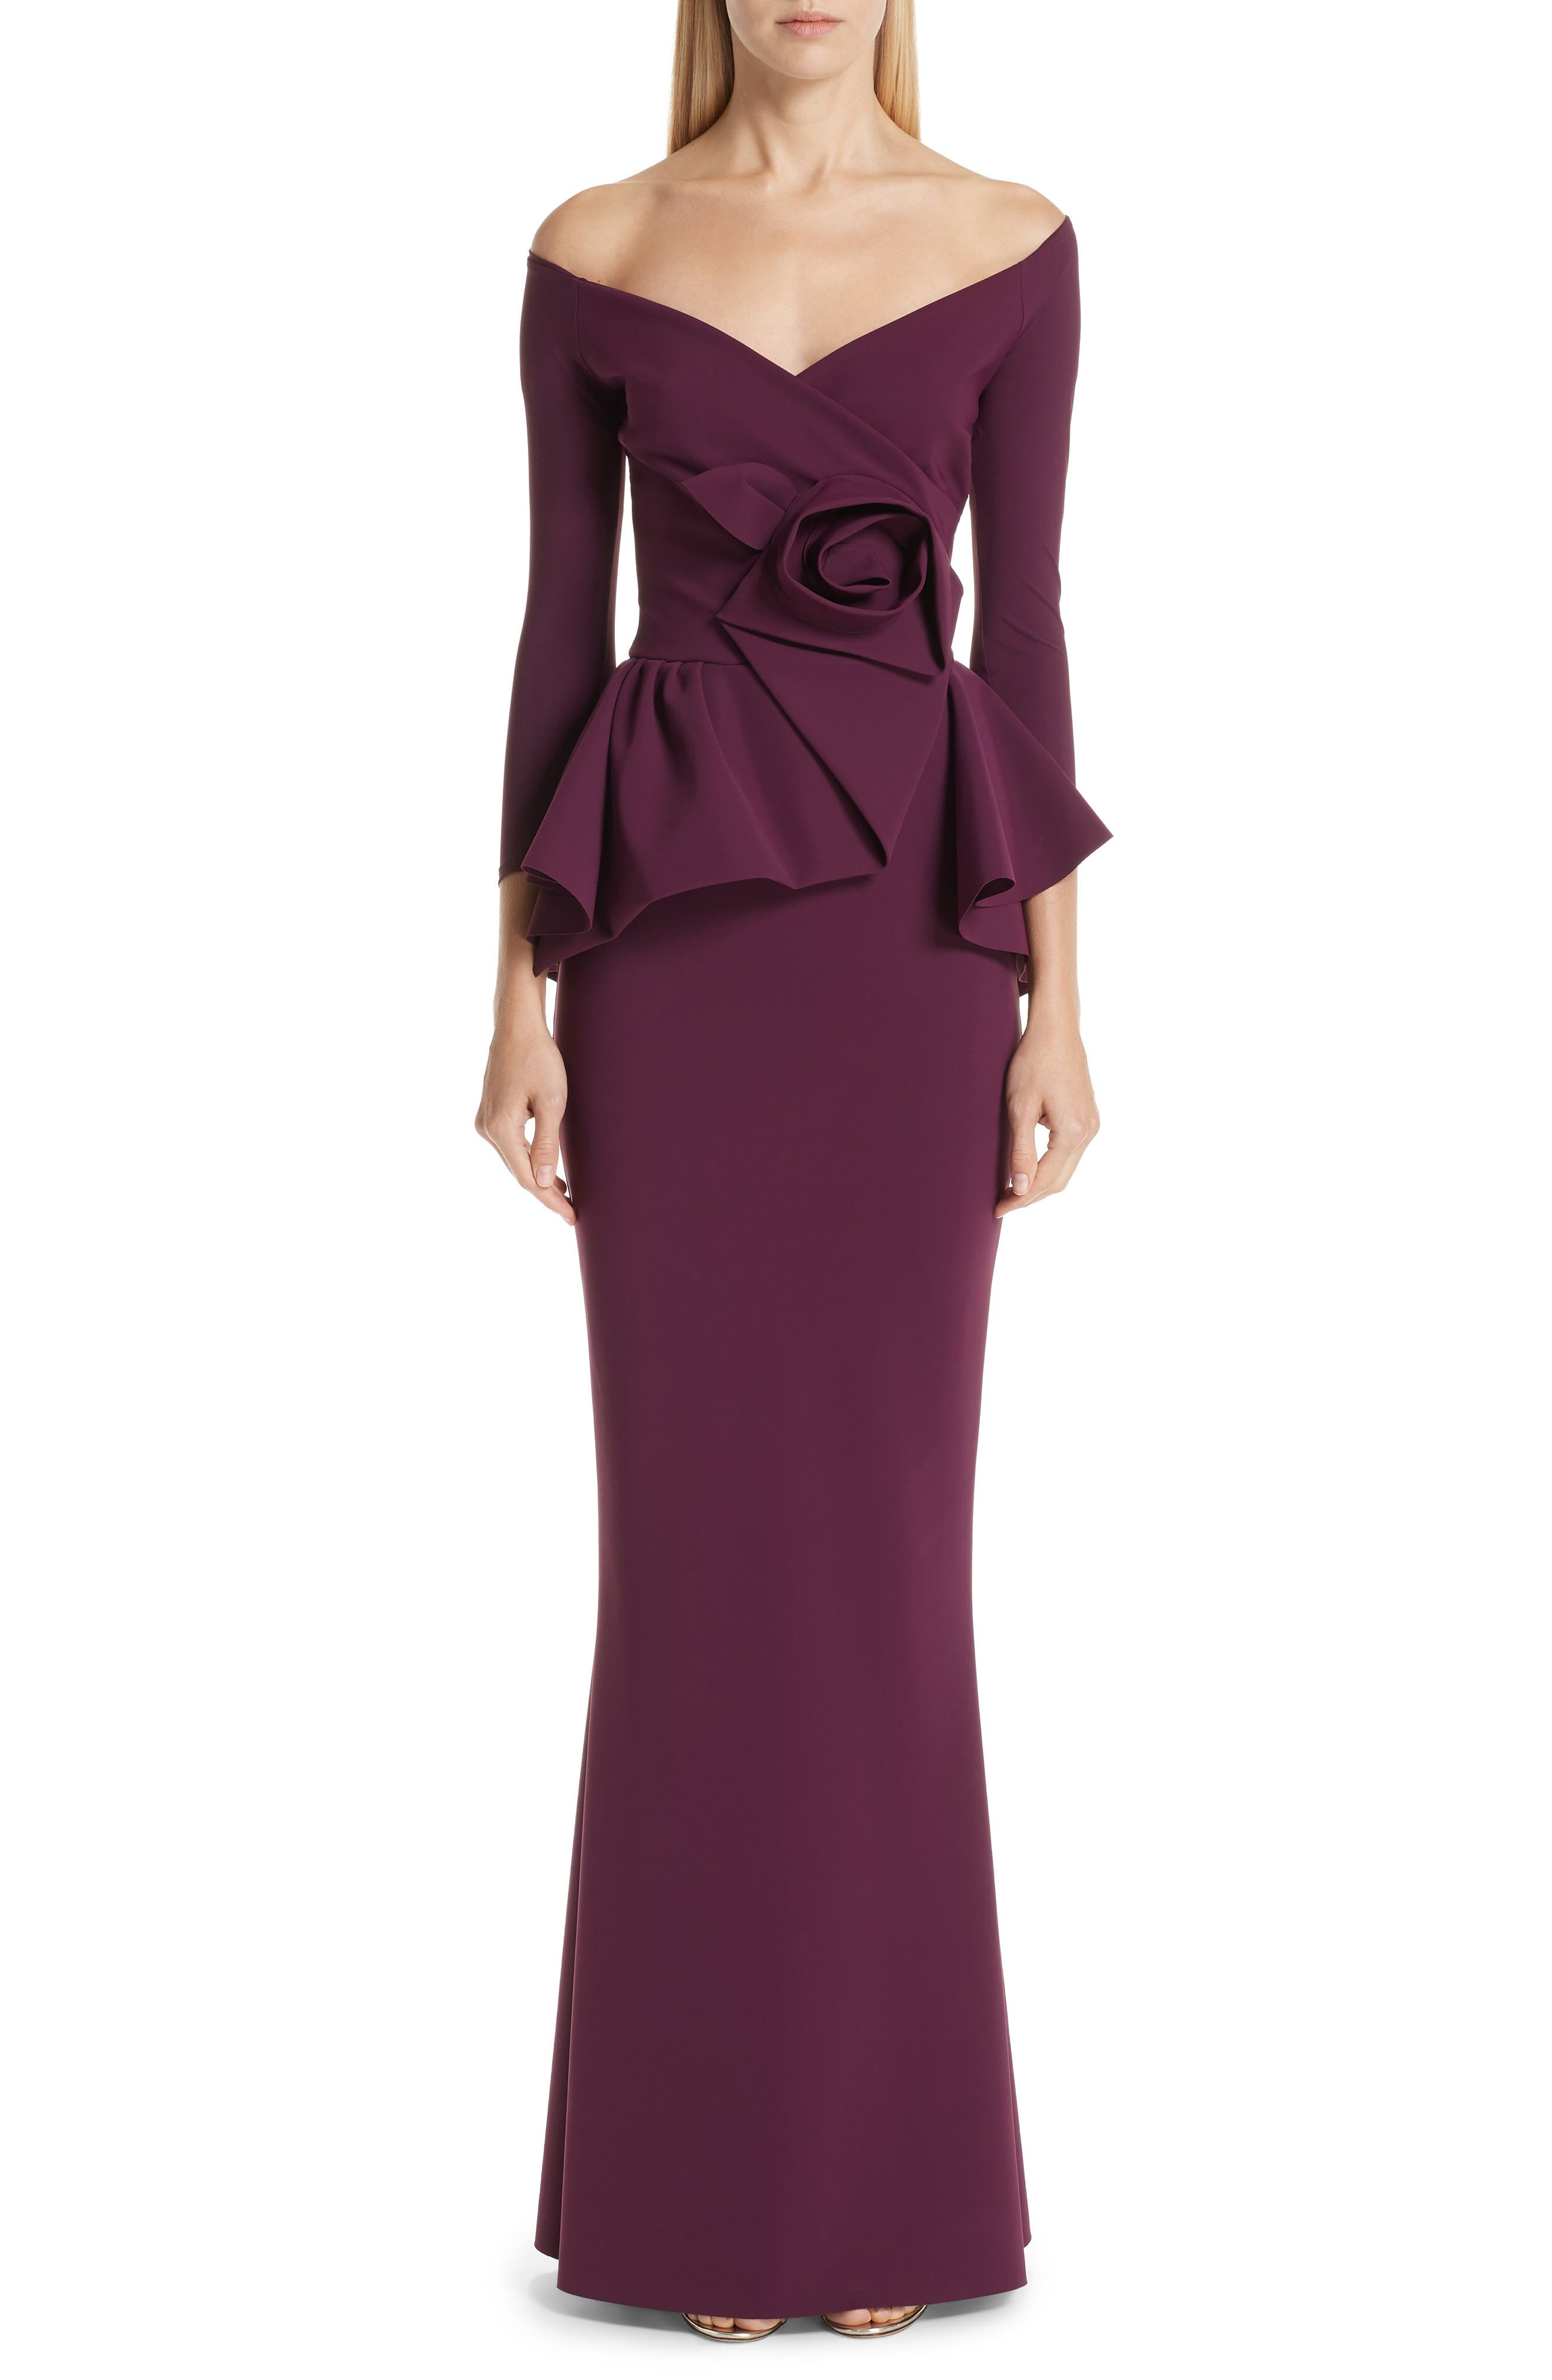 Chiara Boni La Petite Robe Almunda Off The Shoulder Peplum Gown